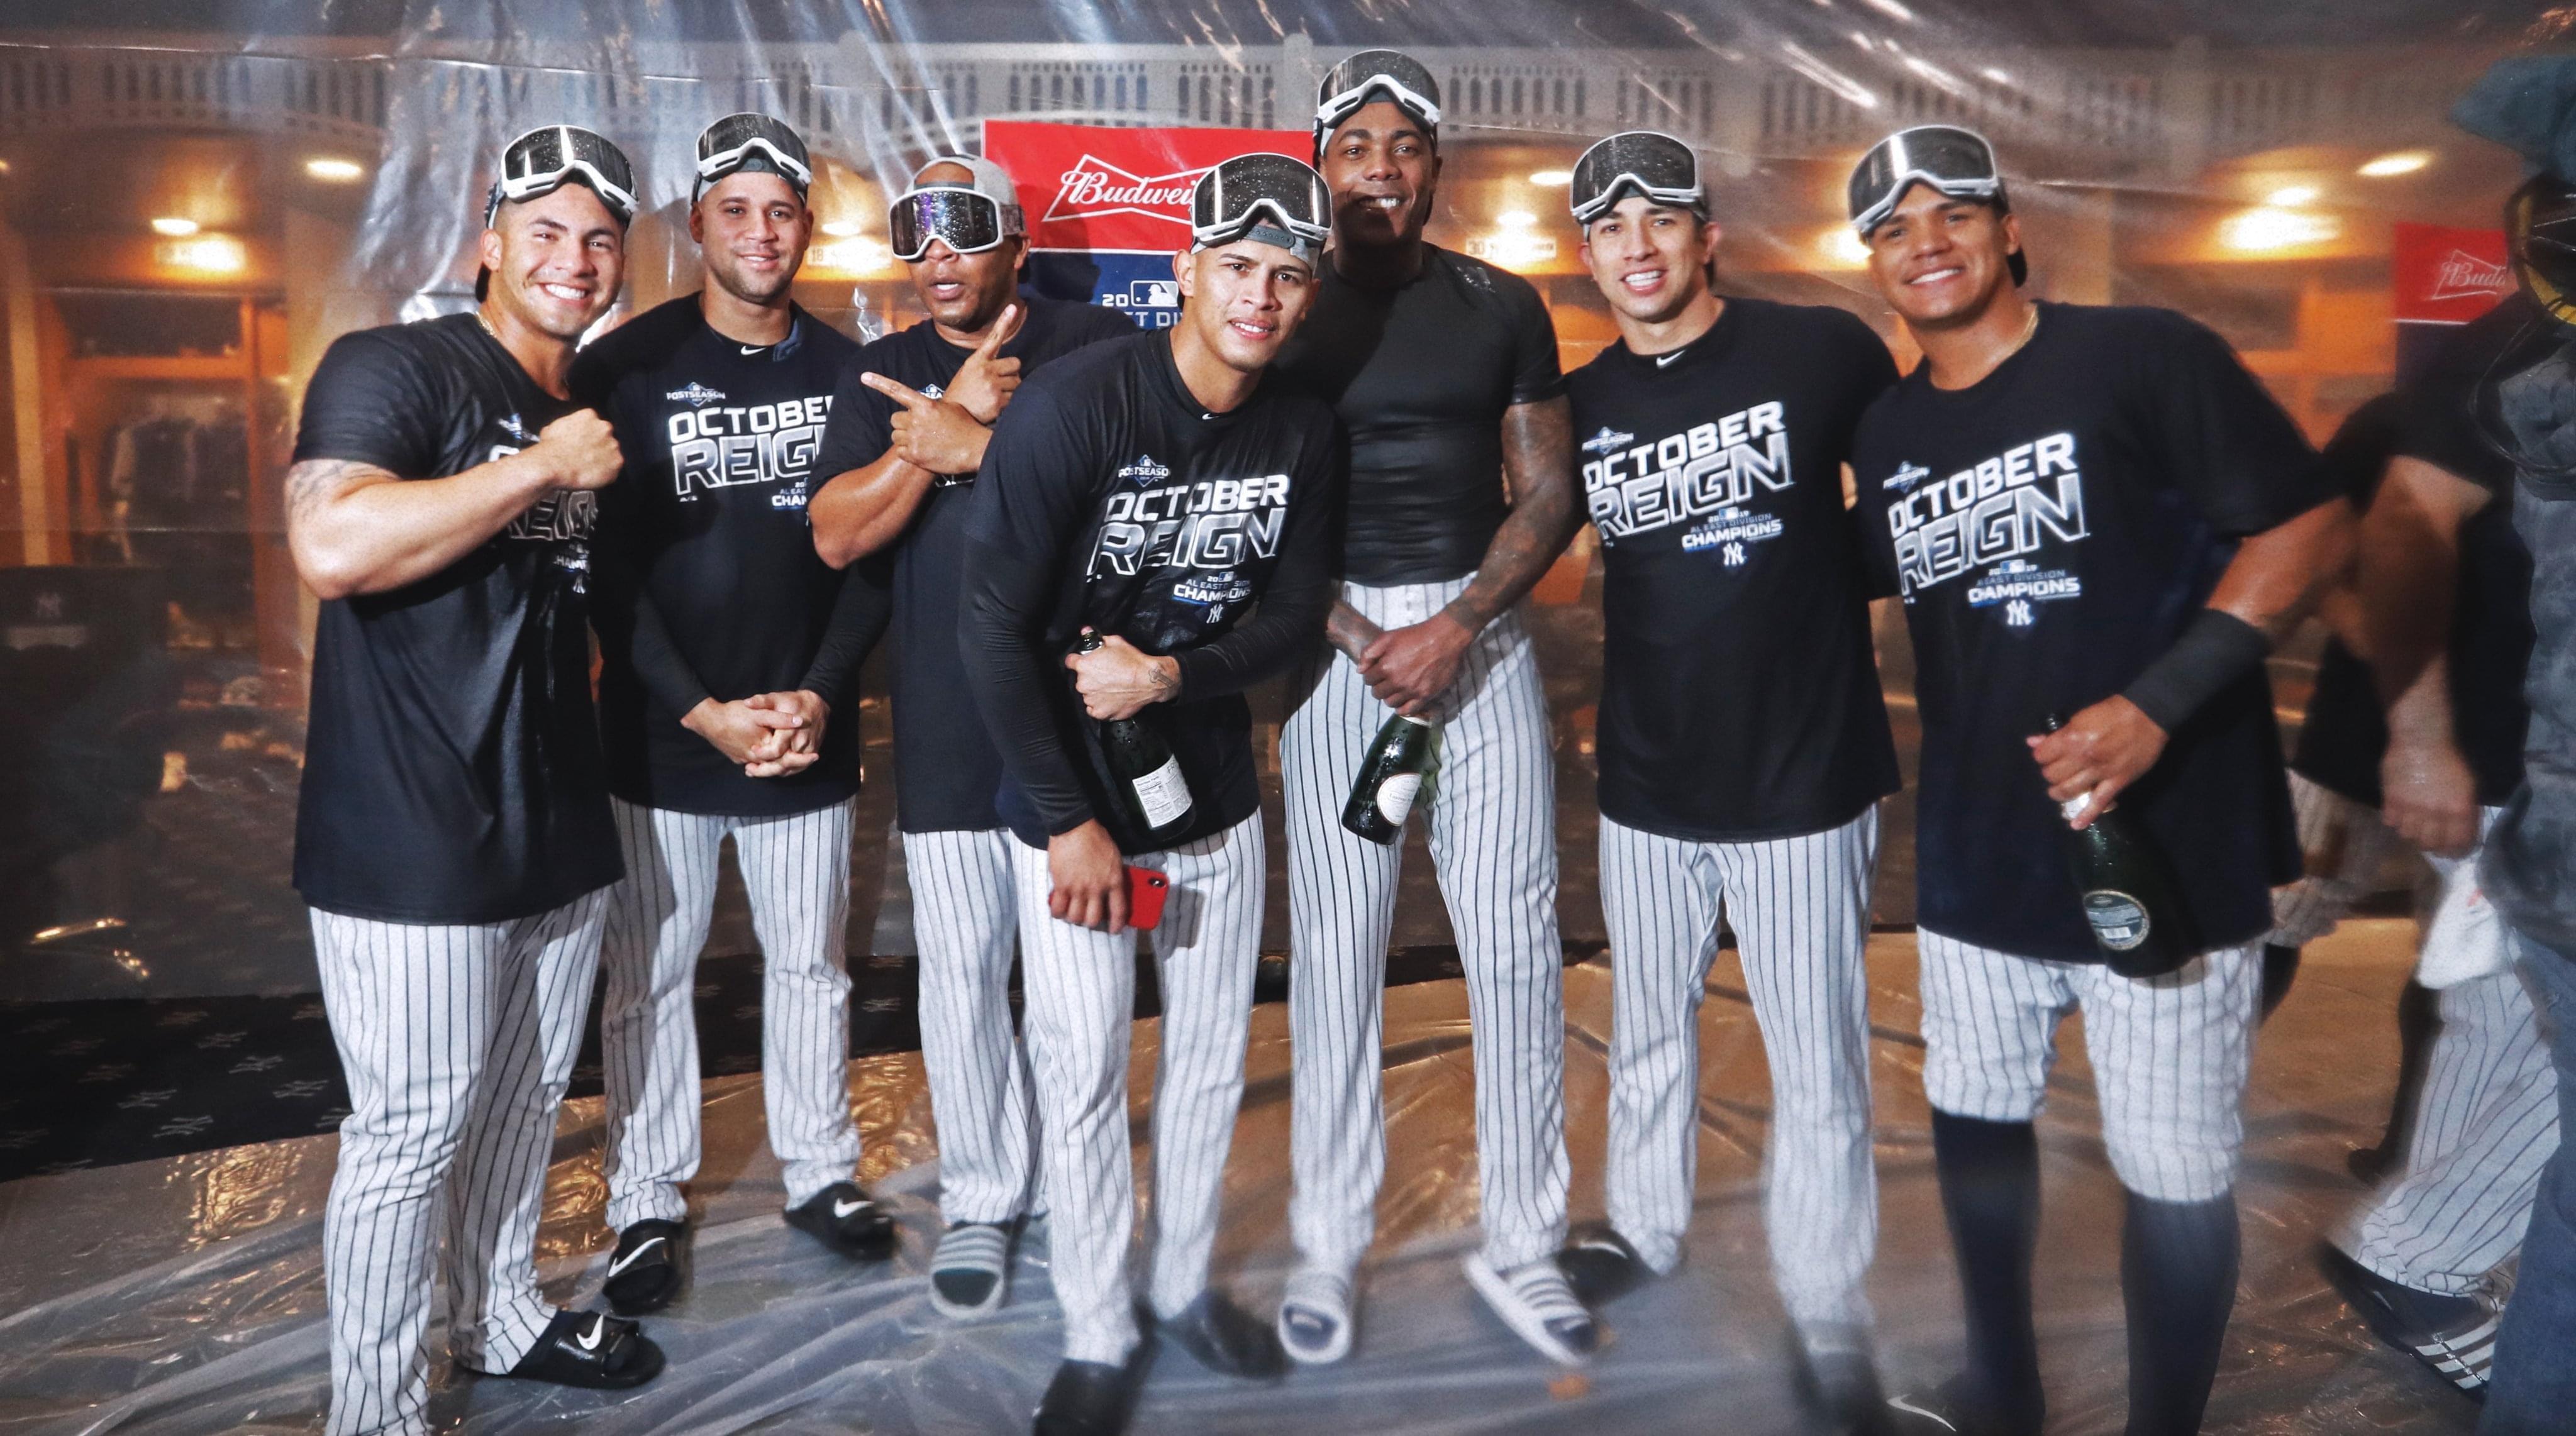 LAMM AT LARGE: Hooked on baseball